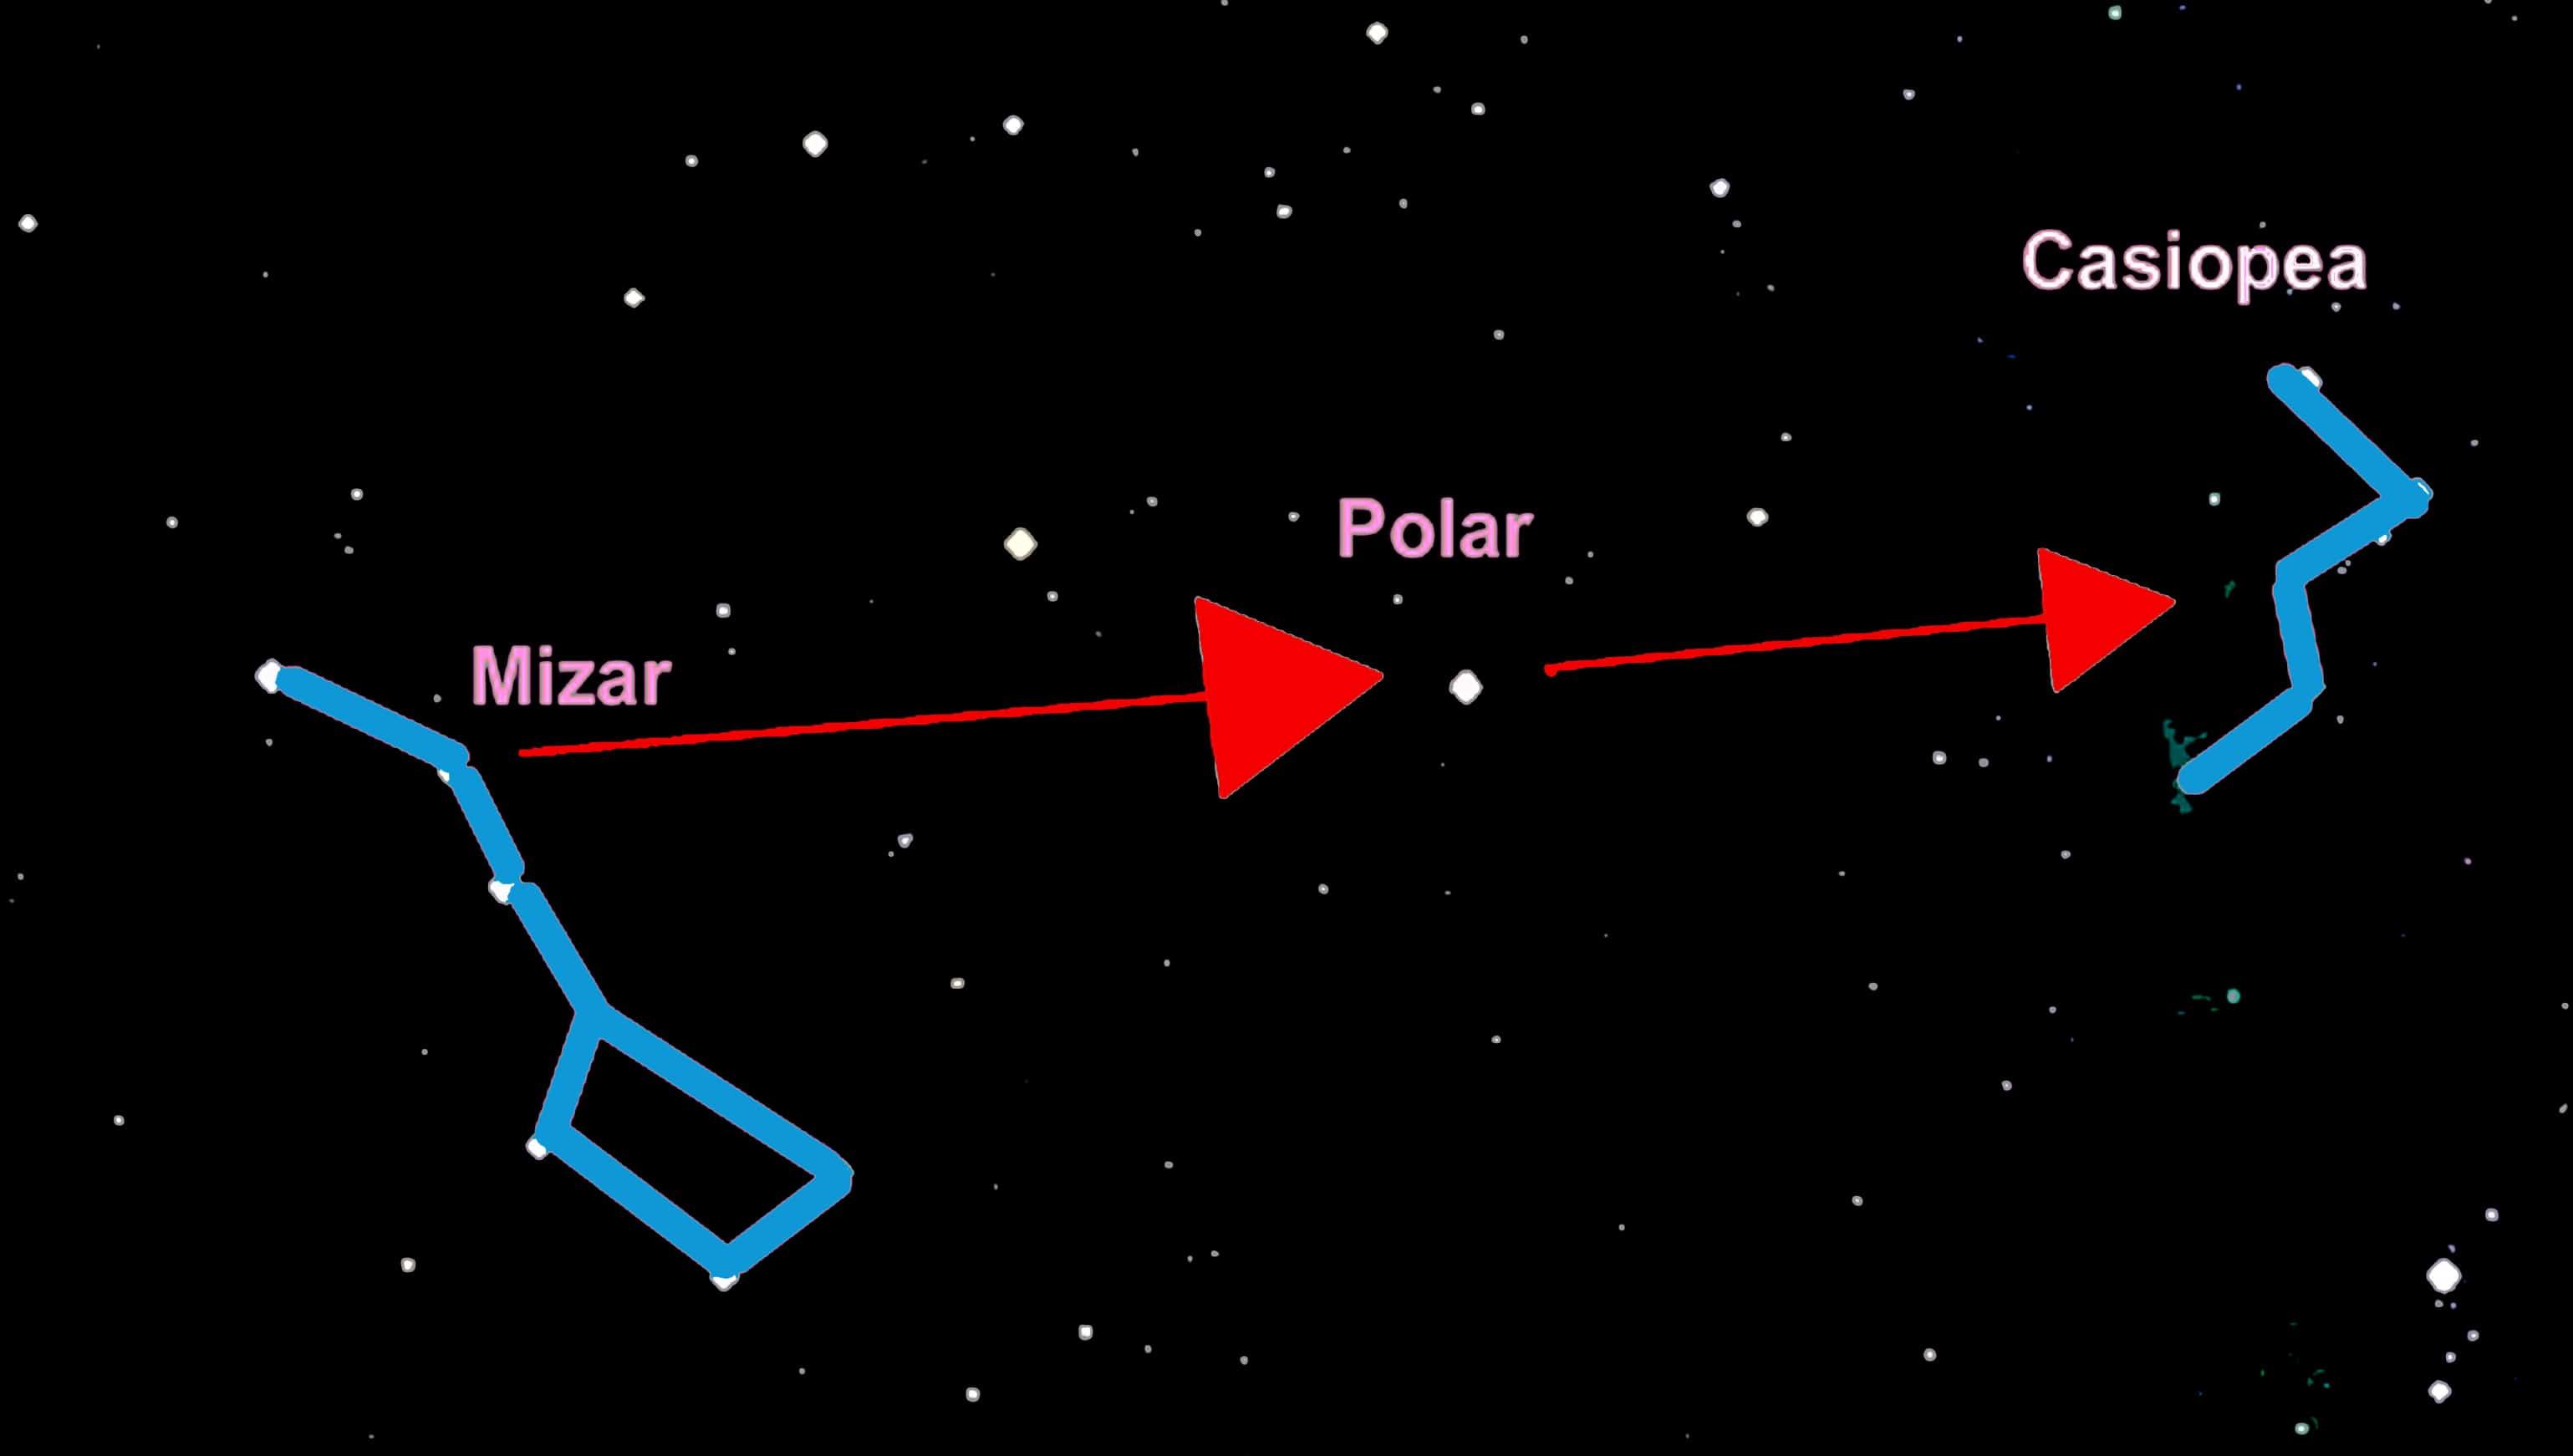 constelacion casiopea5